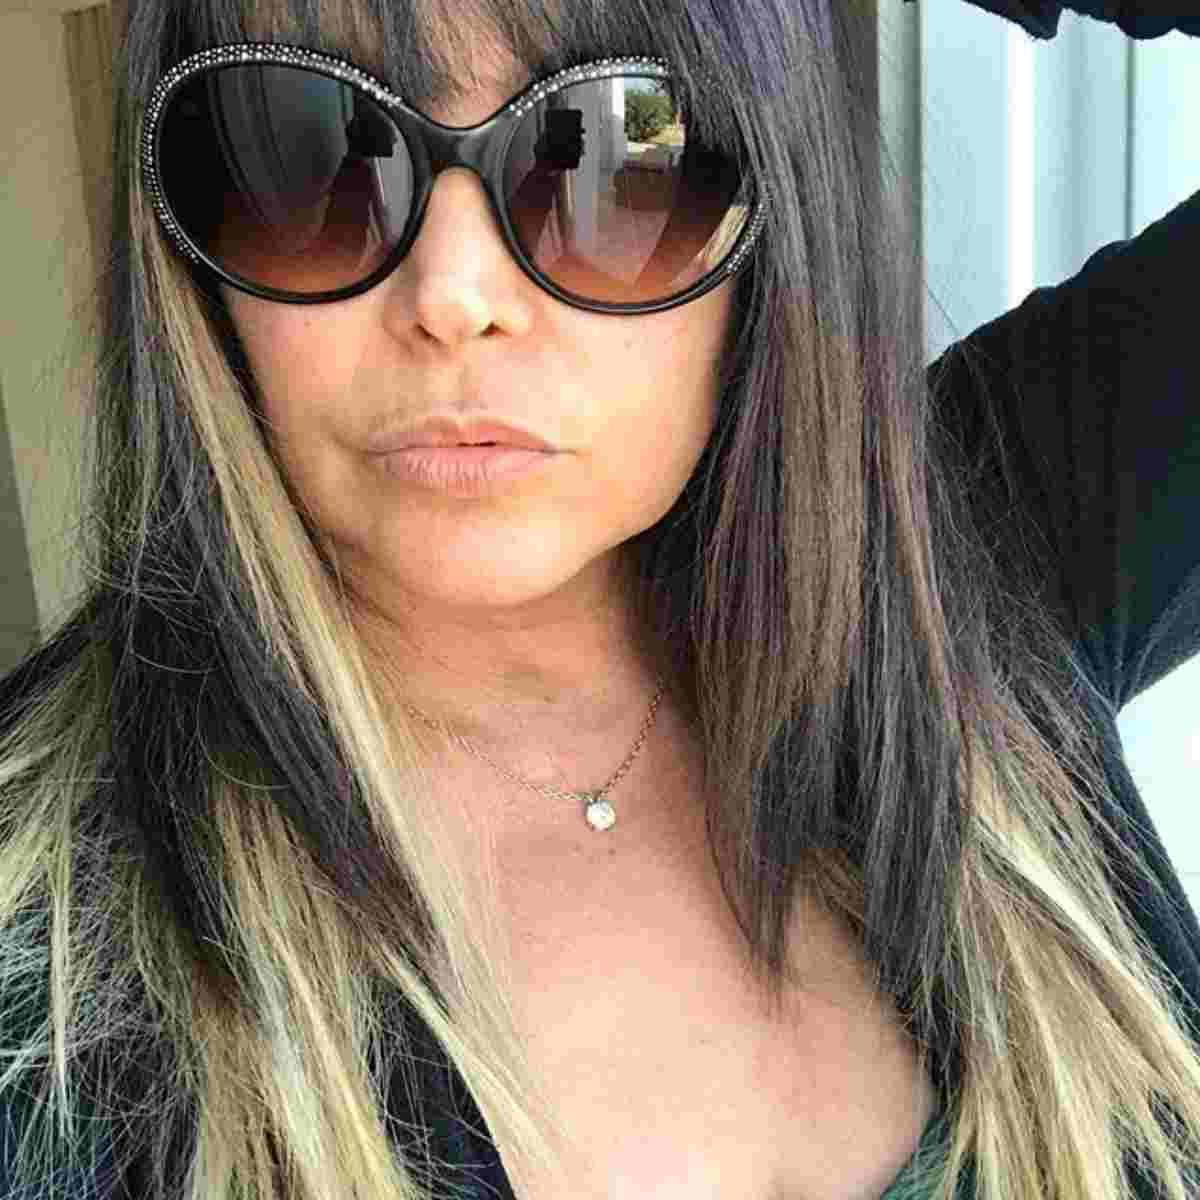 Devin DeVazquez moglie Ronn Moss chi è? Matrimonio, età